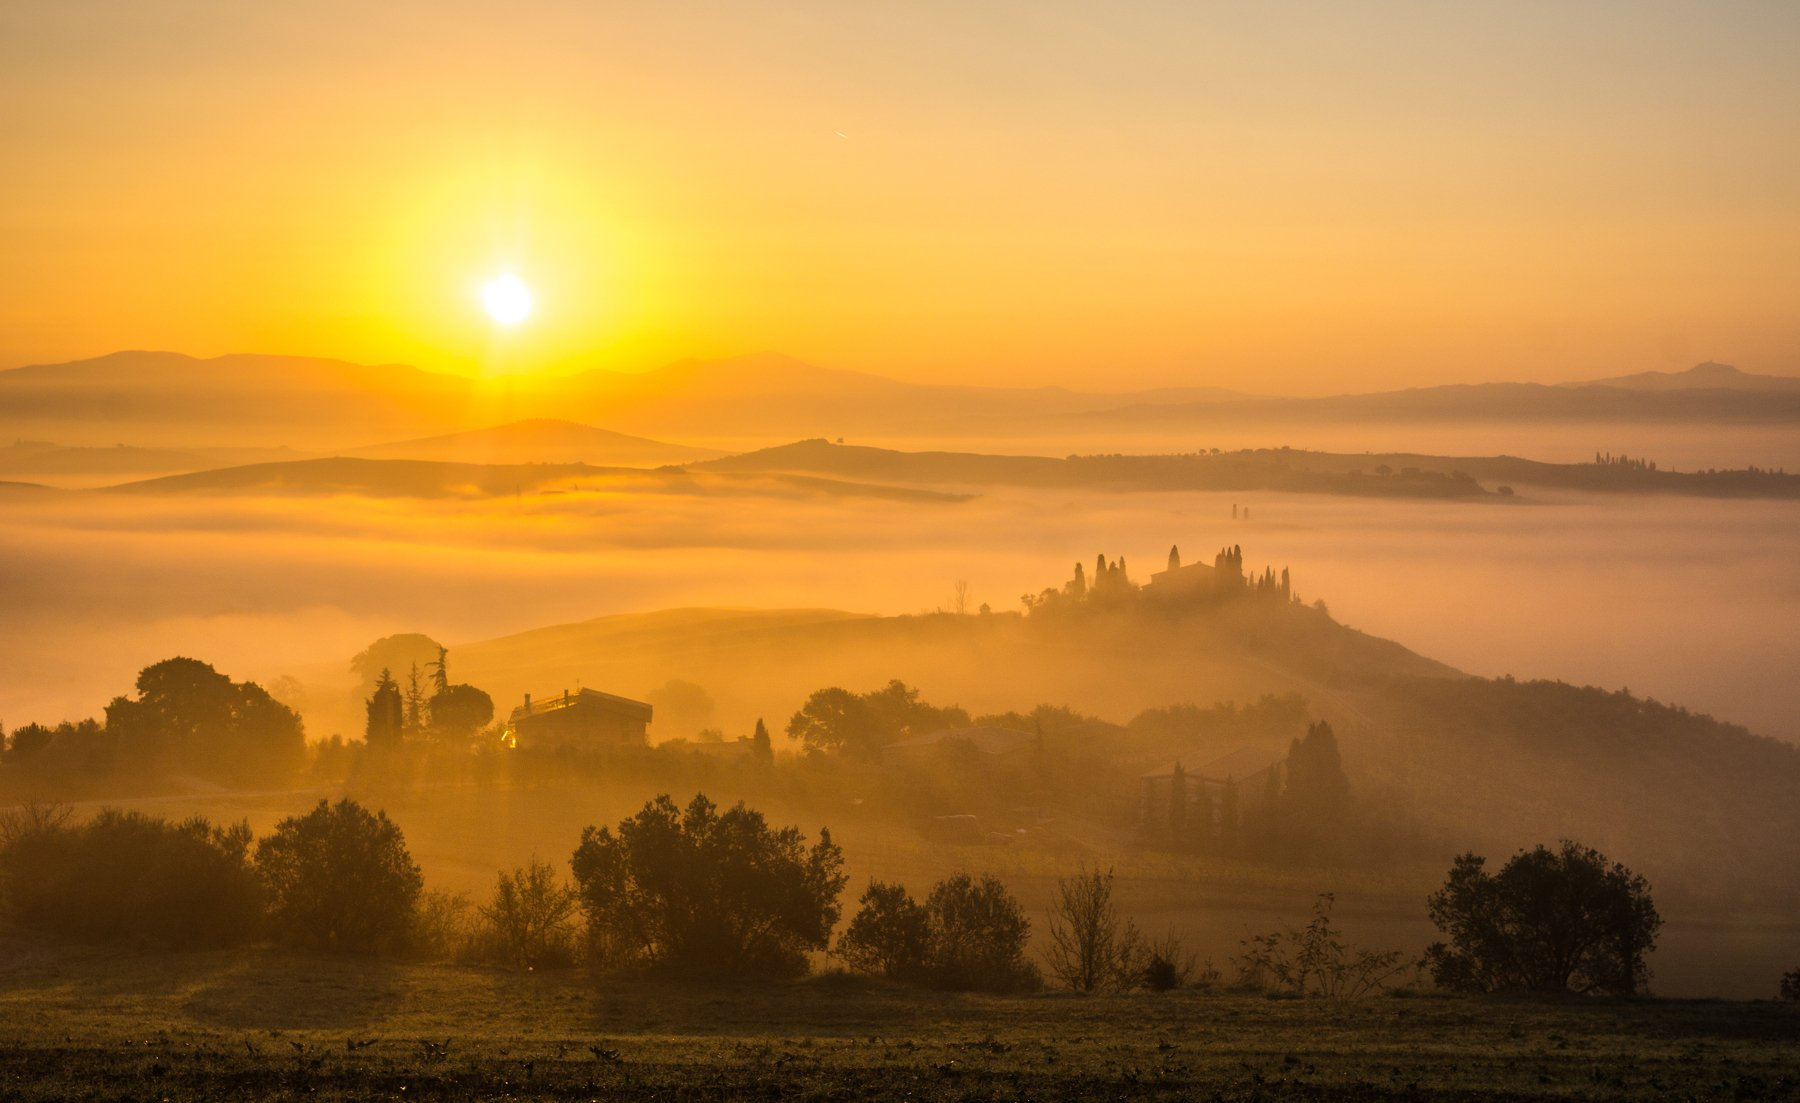 тоскана, природа, утро, туман, пейзаж, италия, путешествие, европа, д'орча,  tuscany, nature, morning, fog, landscape, italy, journey, europe, d'orcia, Ashot Grigoryan